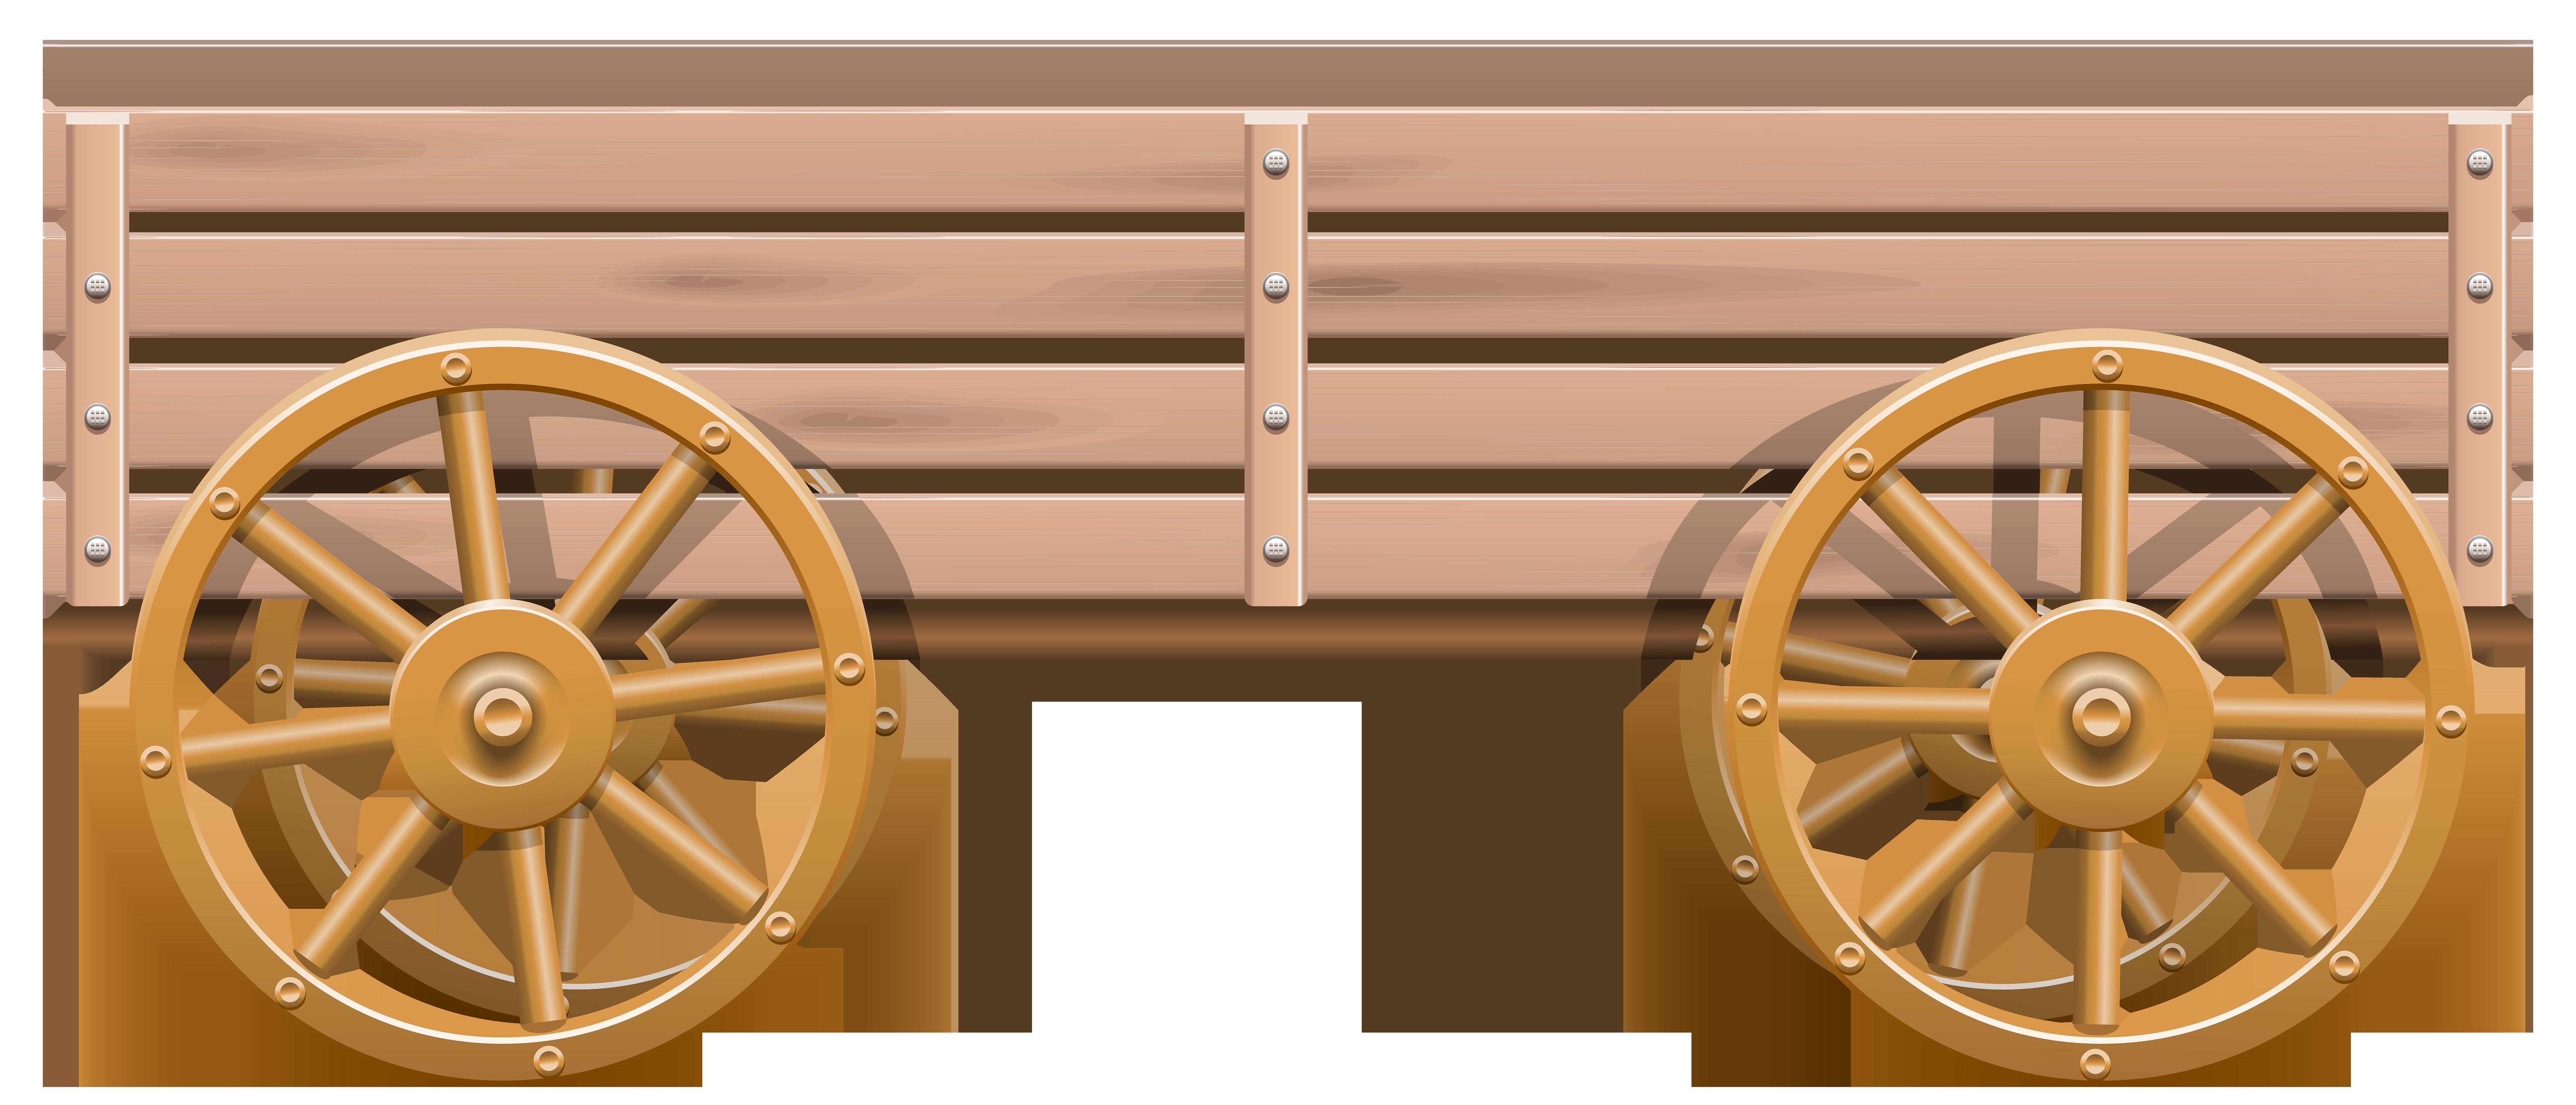 Wooden car clipart clip transparent Wooden Cart PNG Clip Art - Best WEB Clipart clip transparent